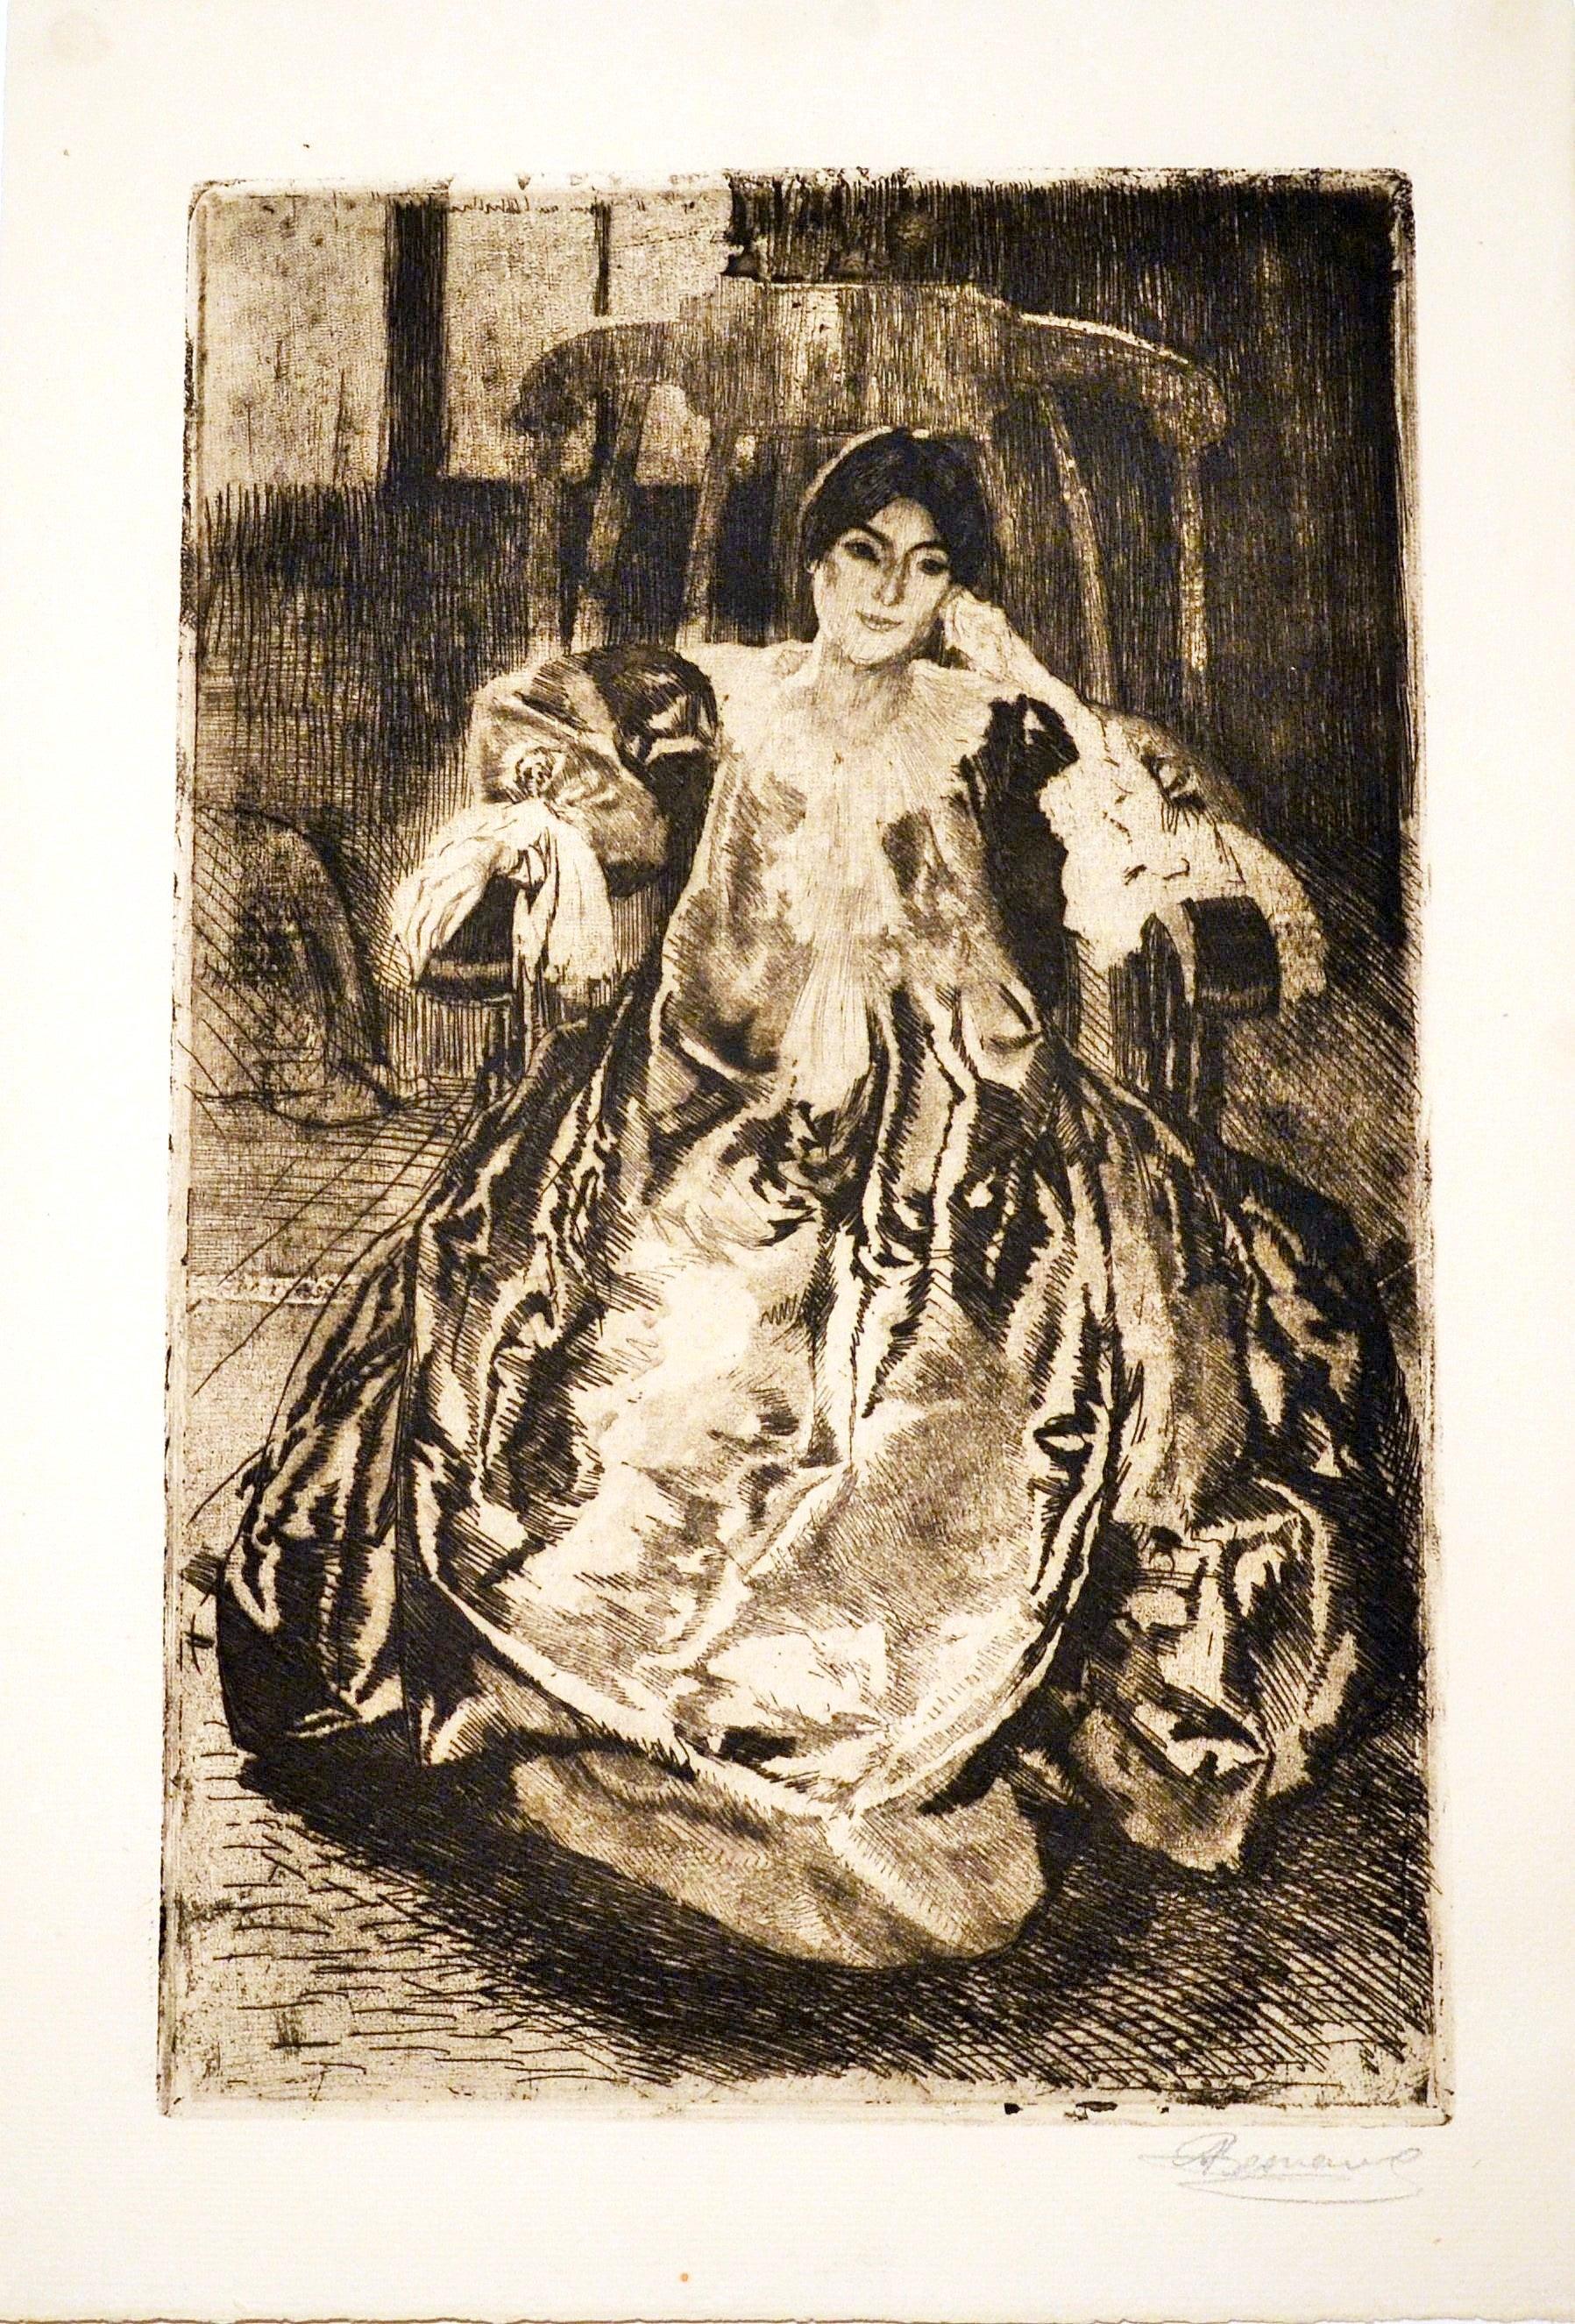 La Robe de Soie - Original Etching and Drypoint by Abel Besnard - 1887